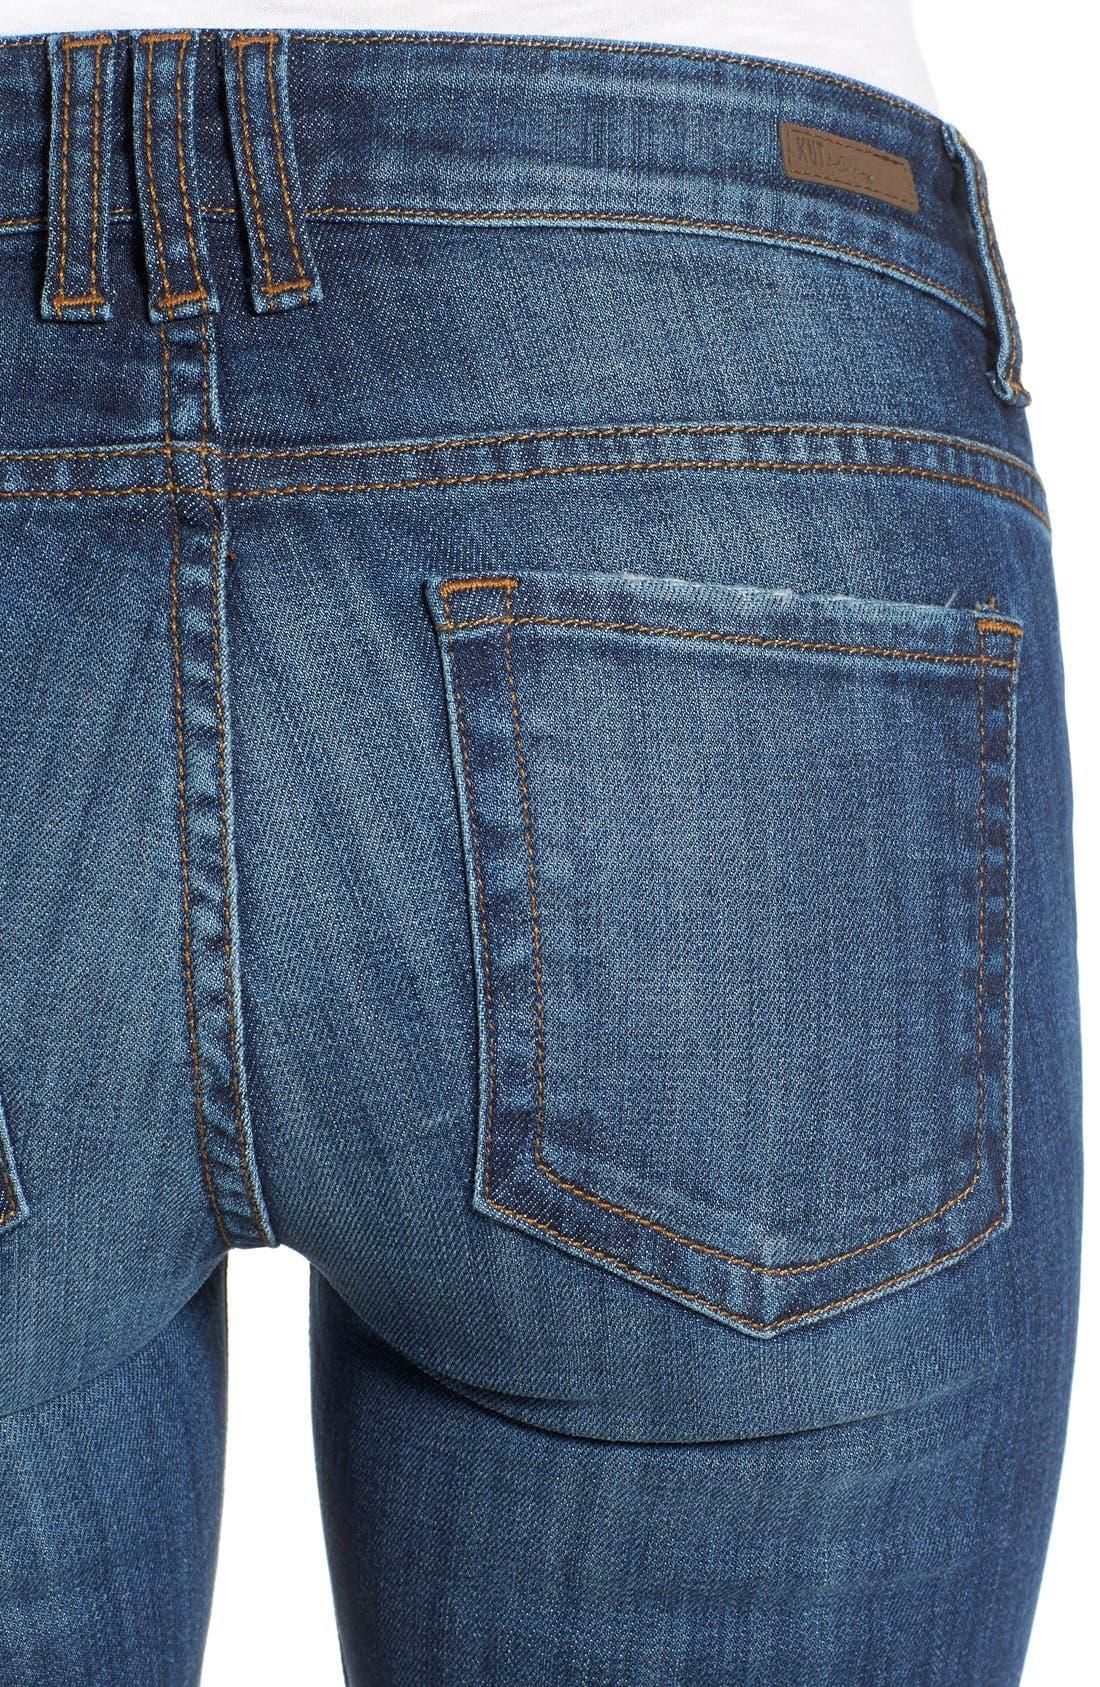 Alternate Image 4  - KUT from the Kloth 'Catherine' Distressed Stretch Boyfriend Jeans (Yearn) (Regular & Petite)